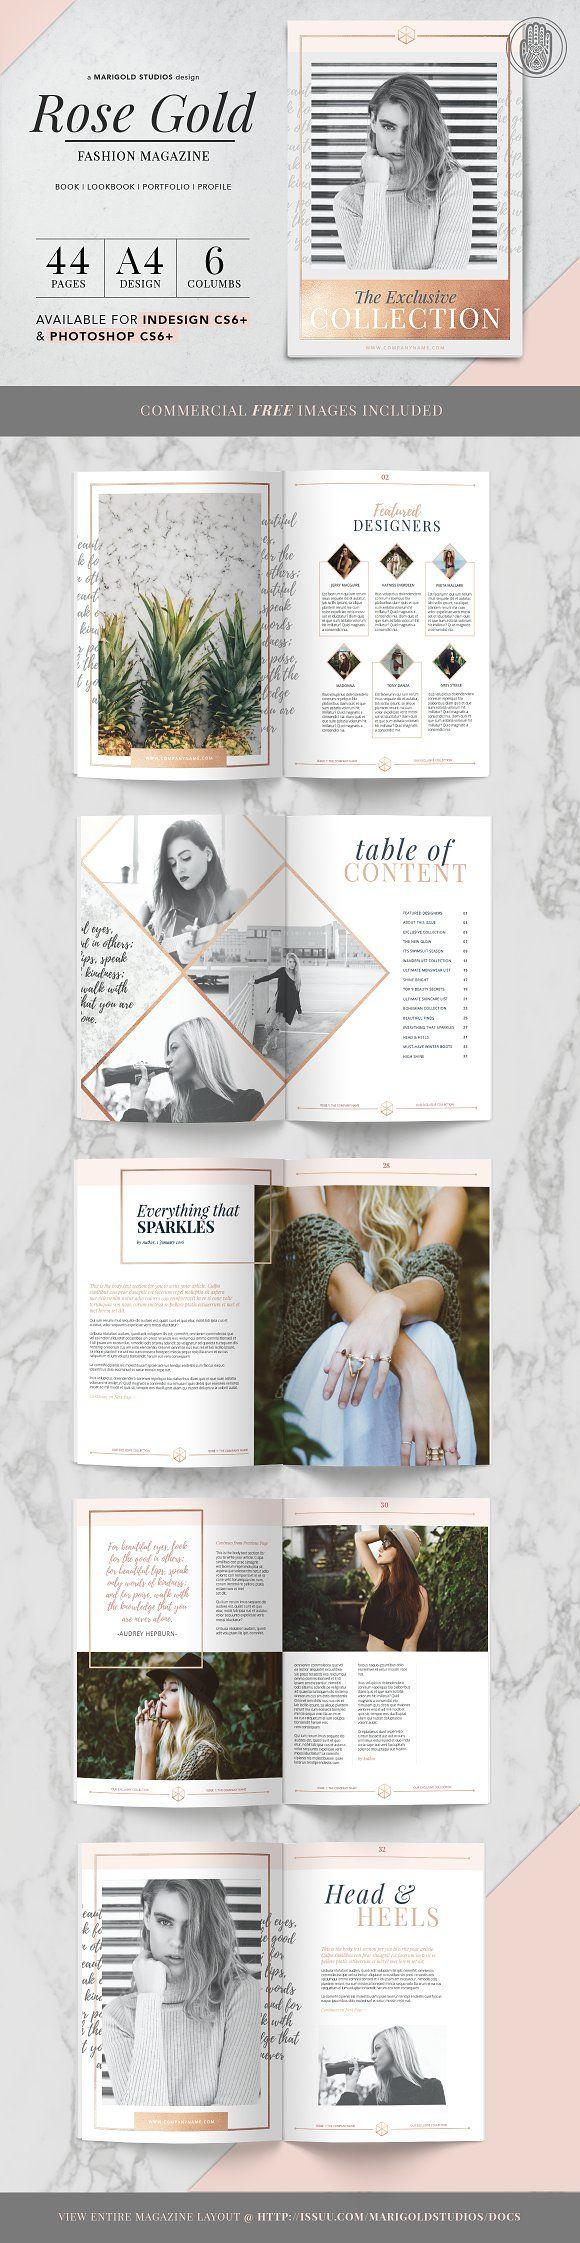 ROSE GOLD Theme | Magazine by Marigold Studios on @creativemarket